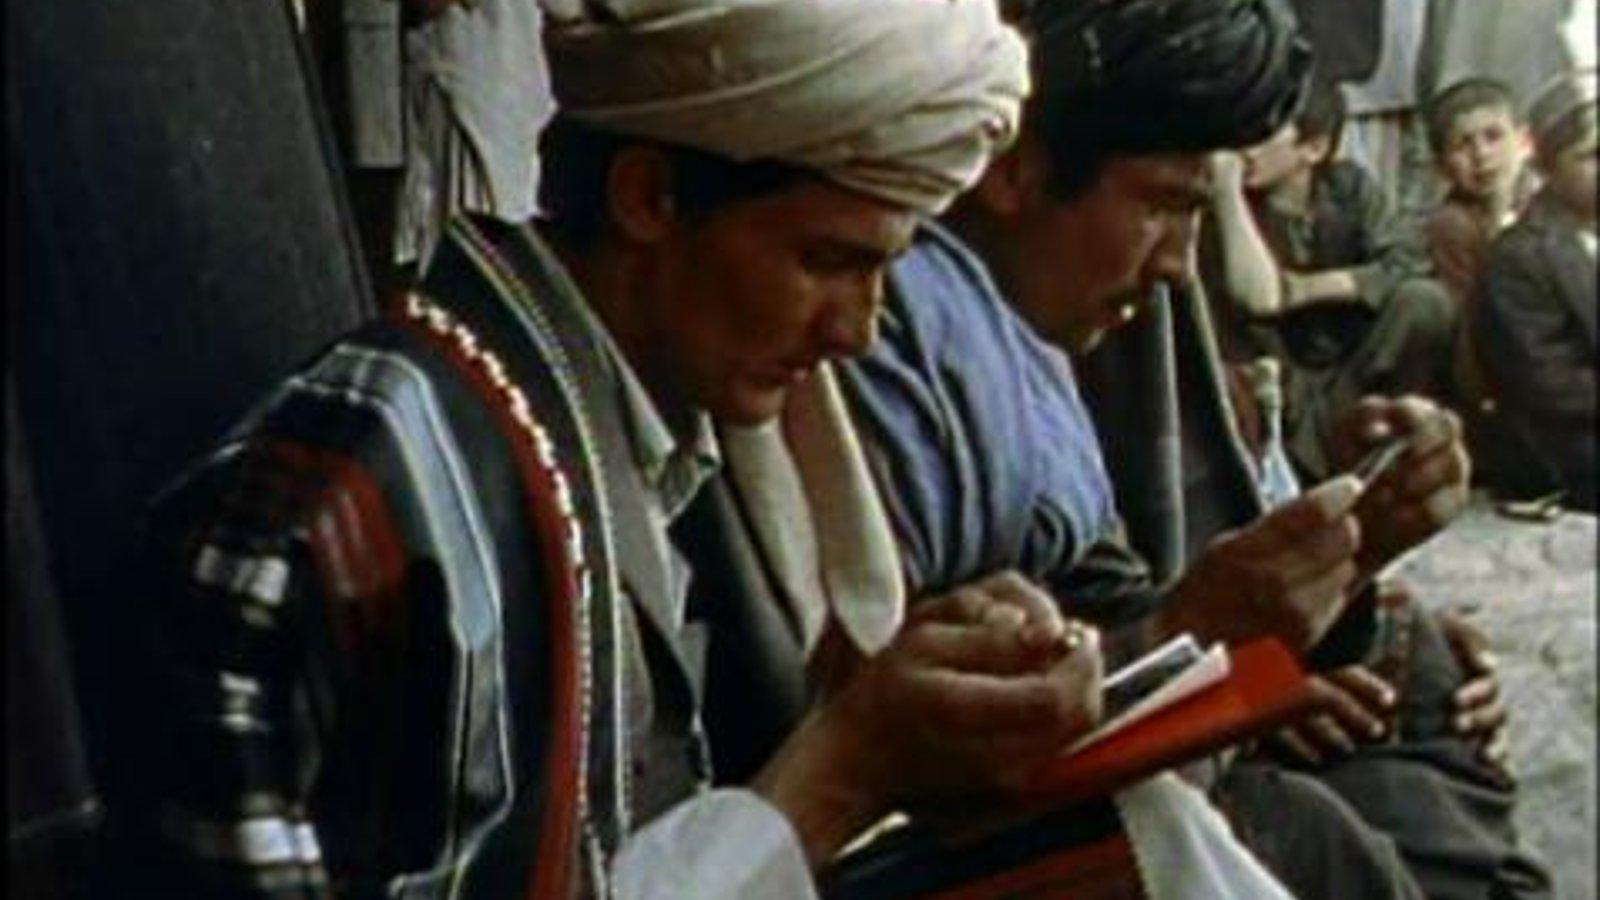 Sons of Haji Omar